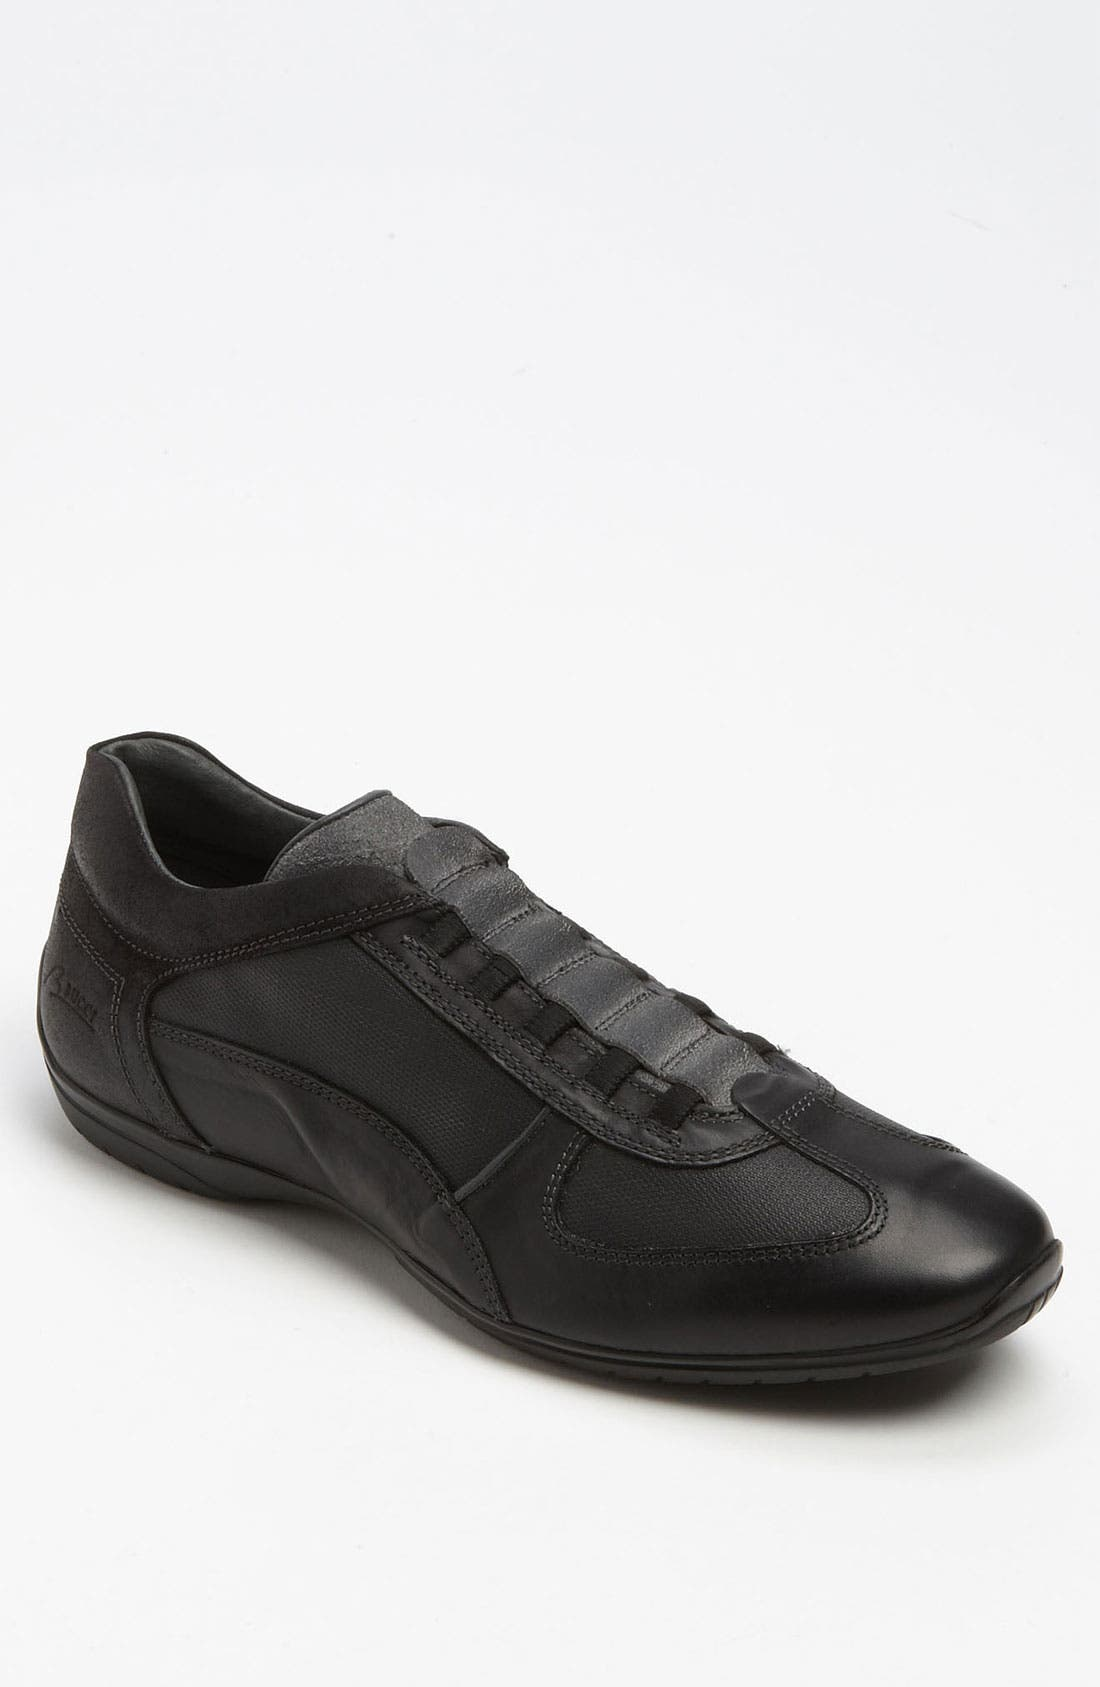 Alternate Image 1 Selected - Bacco Bucci 'Loreto' Sneaker